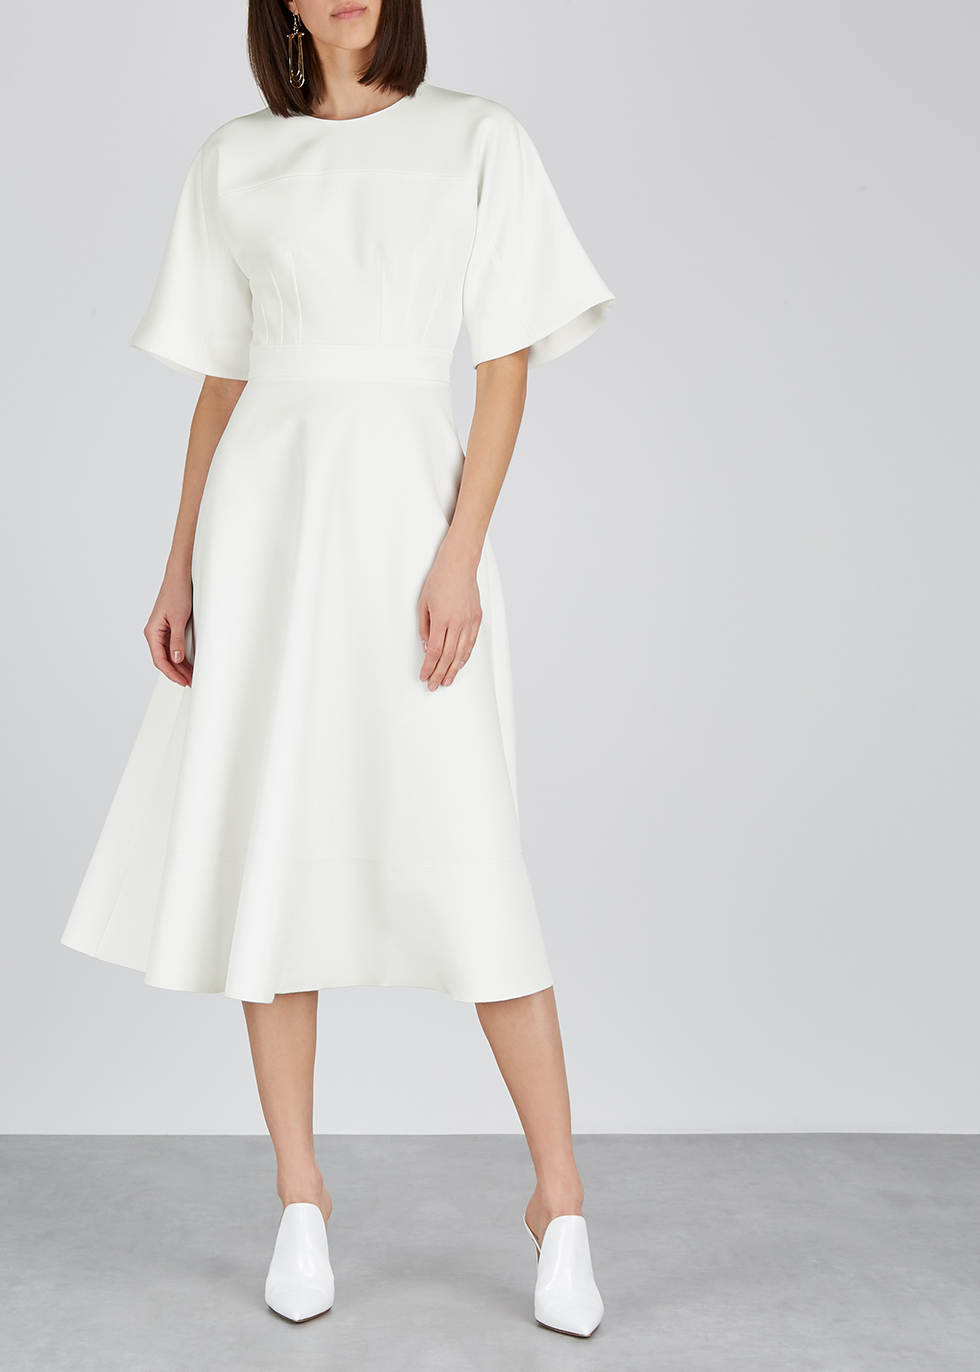 Maja ivory midi dress - Roksanda